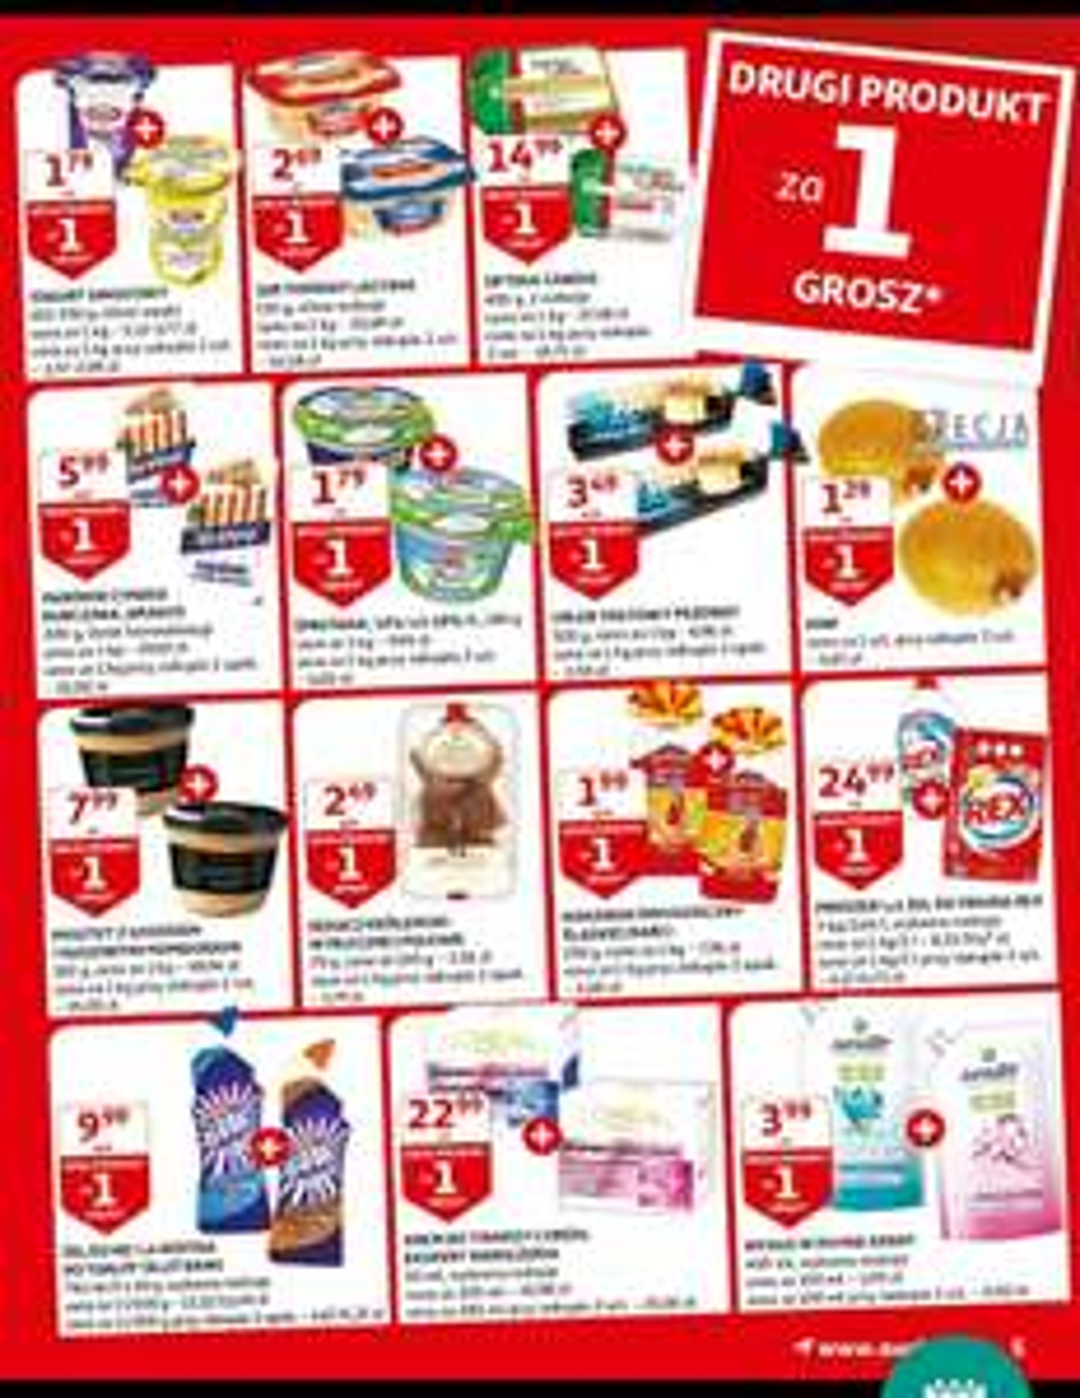 Auchan drugi produkt za 1 grosz